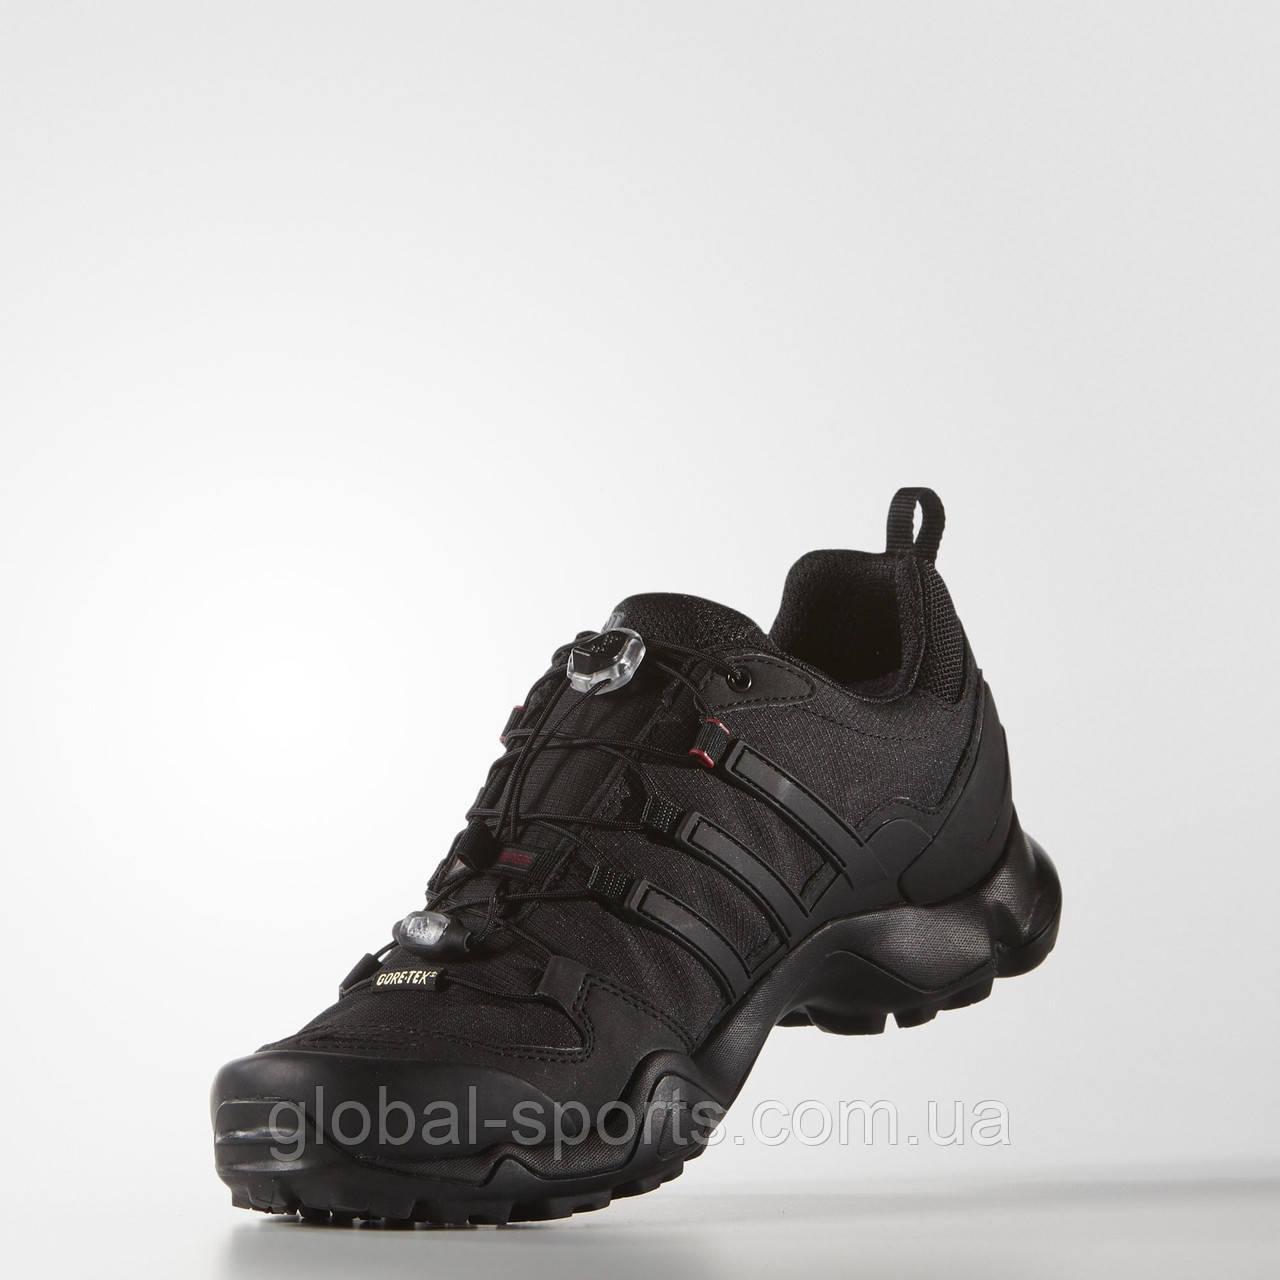 Мужские кроссовки  adidas Terrex Swift Gore-Tex (Артикул:AQ5306)